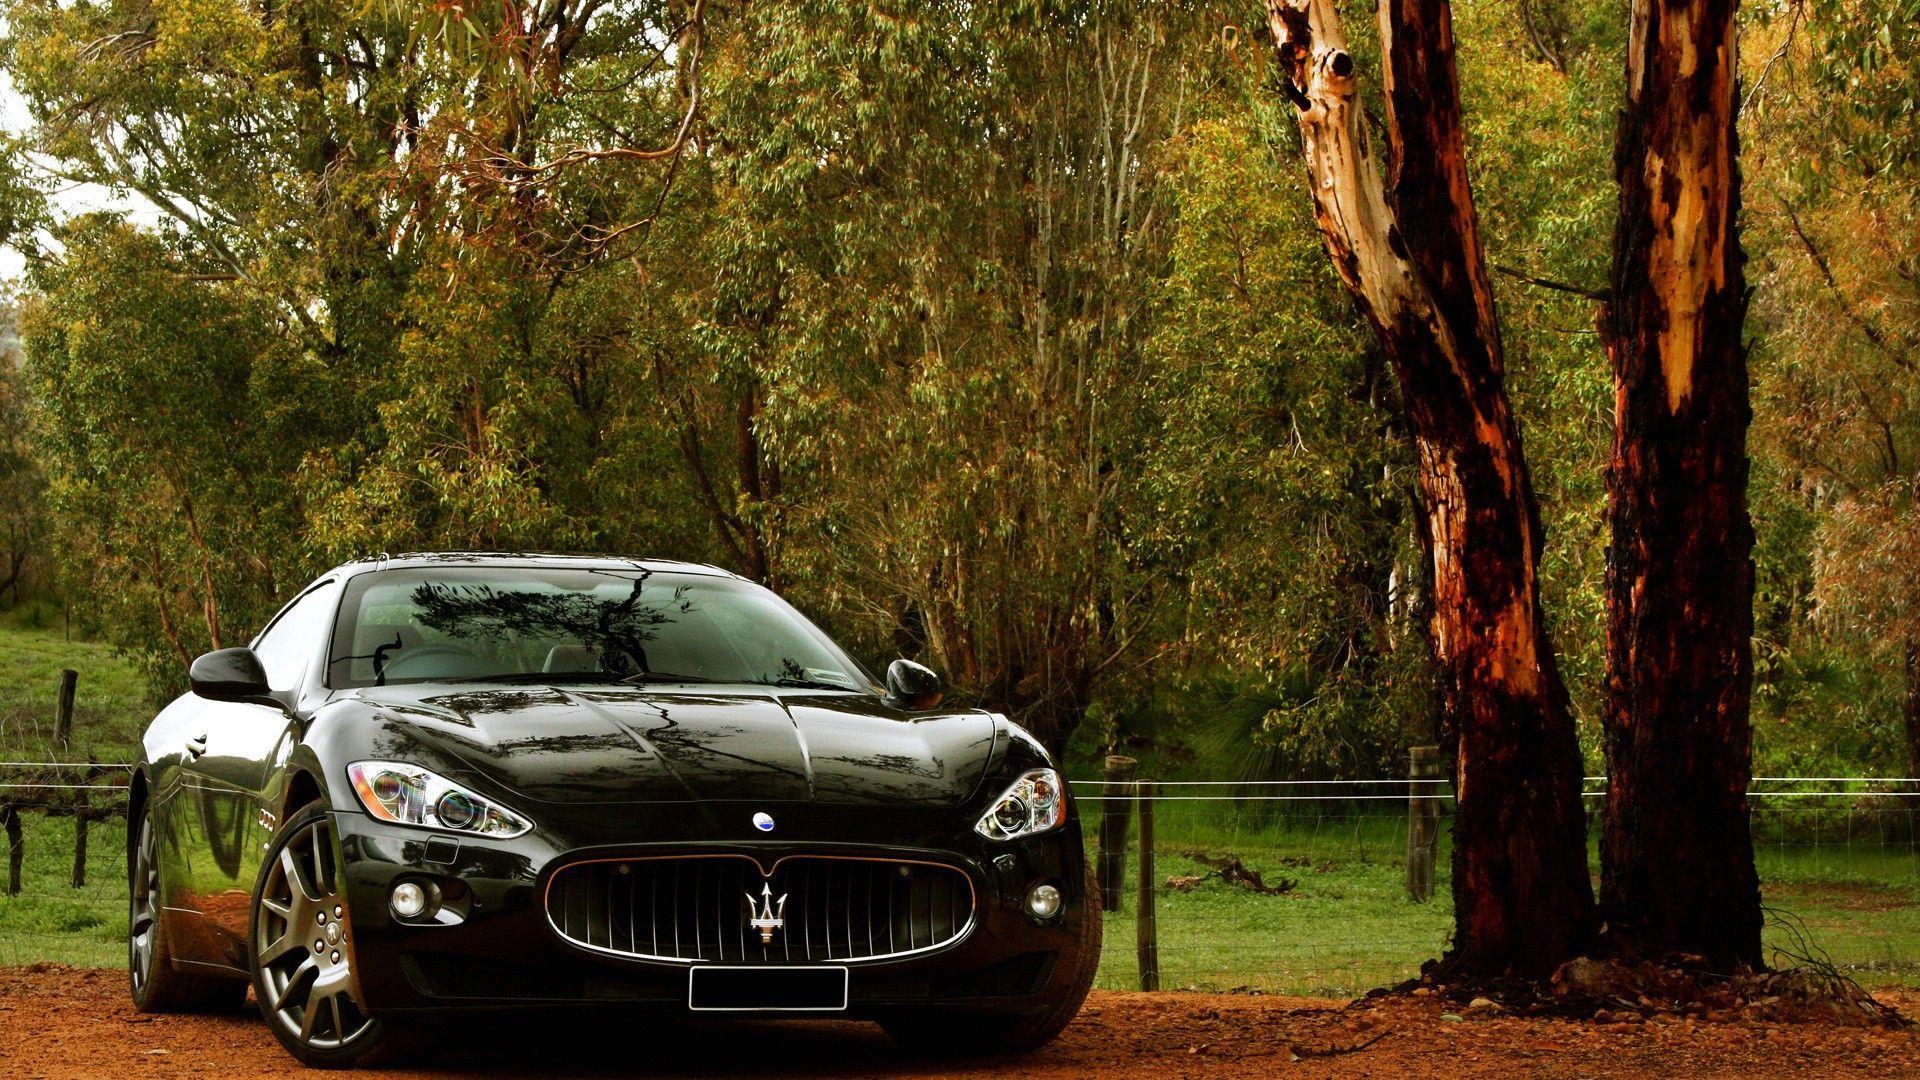 Maserati Wallpaper Hd Iphone